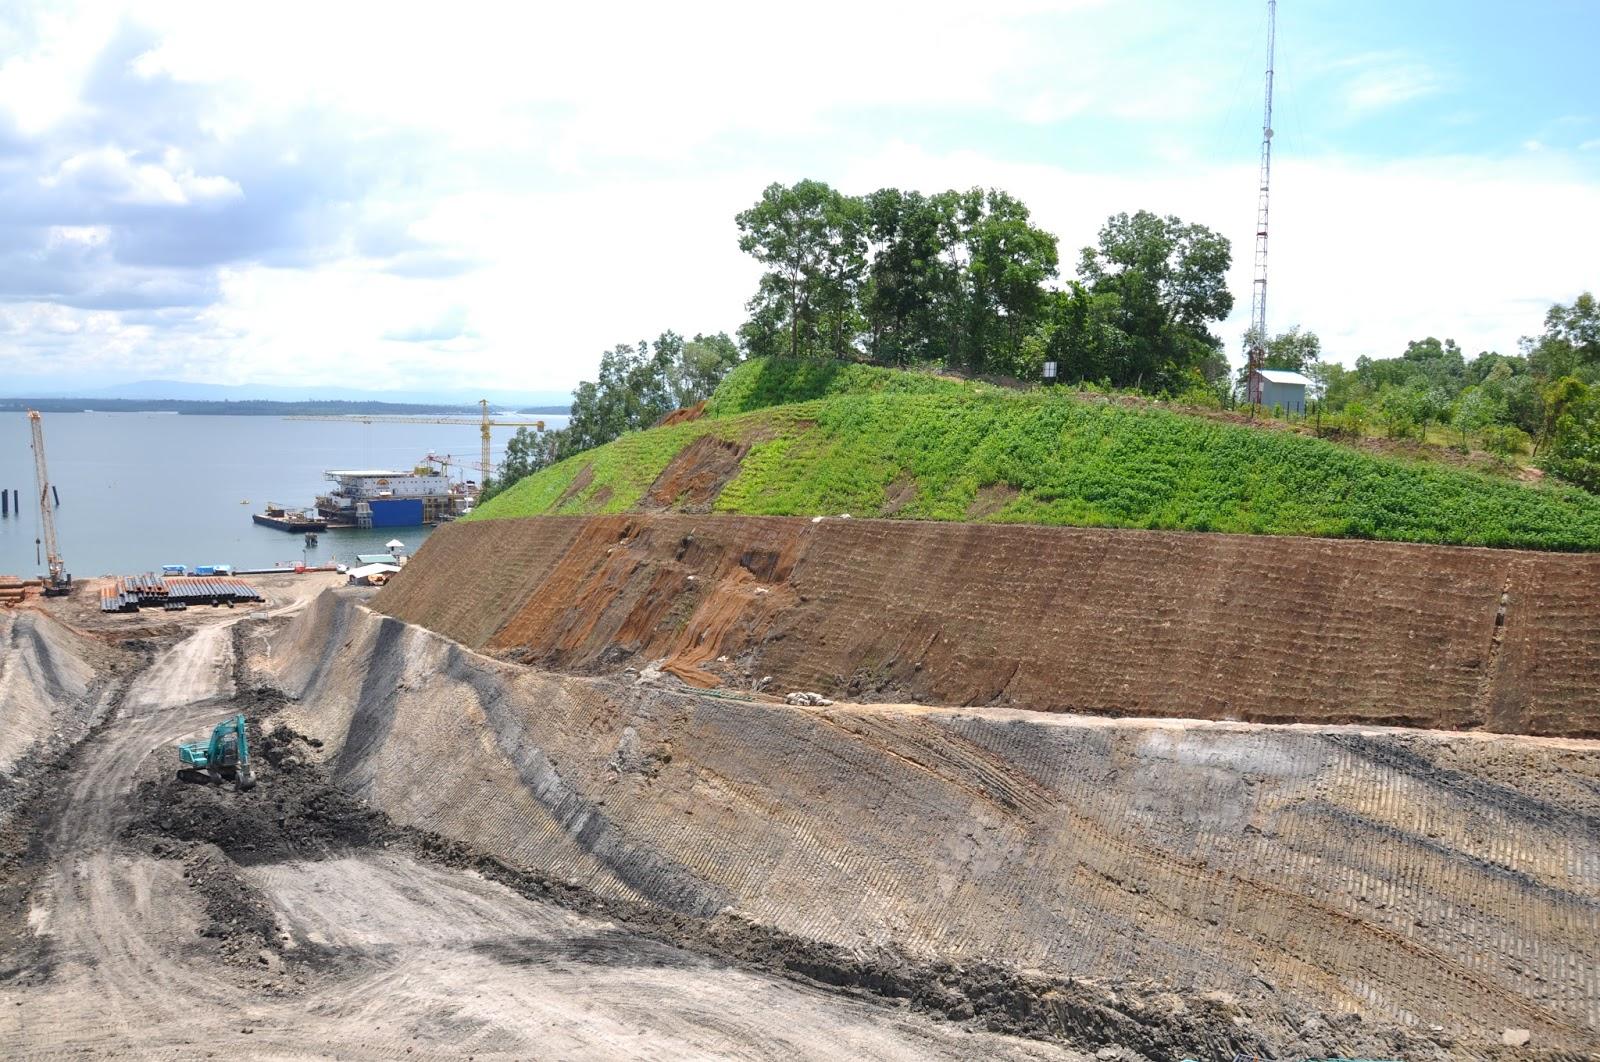 Land reclamation and rehabilitation unitek borneo for Soil reclamation